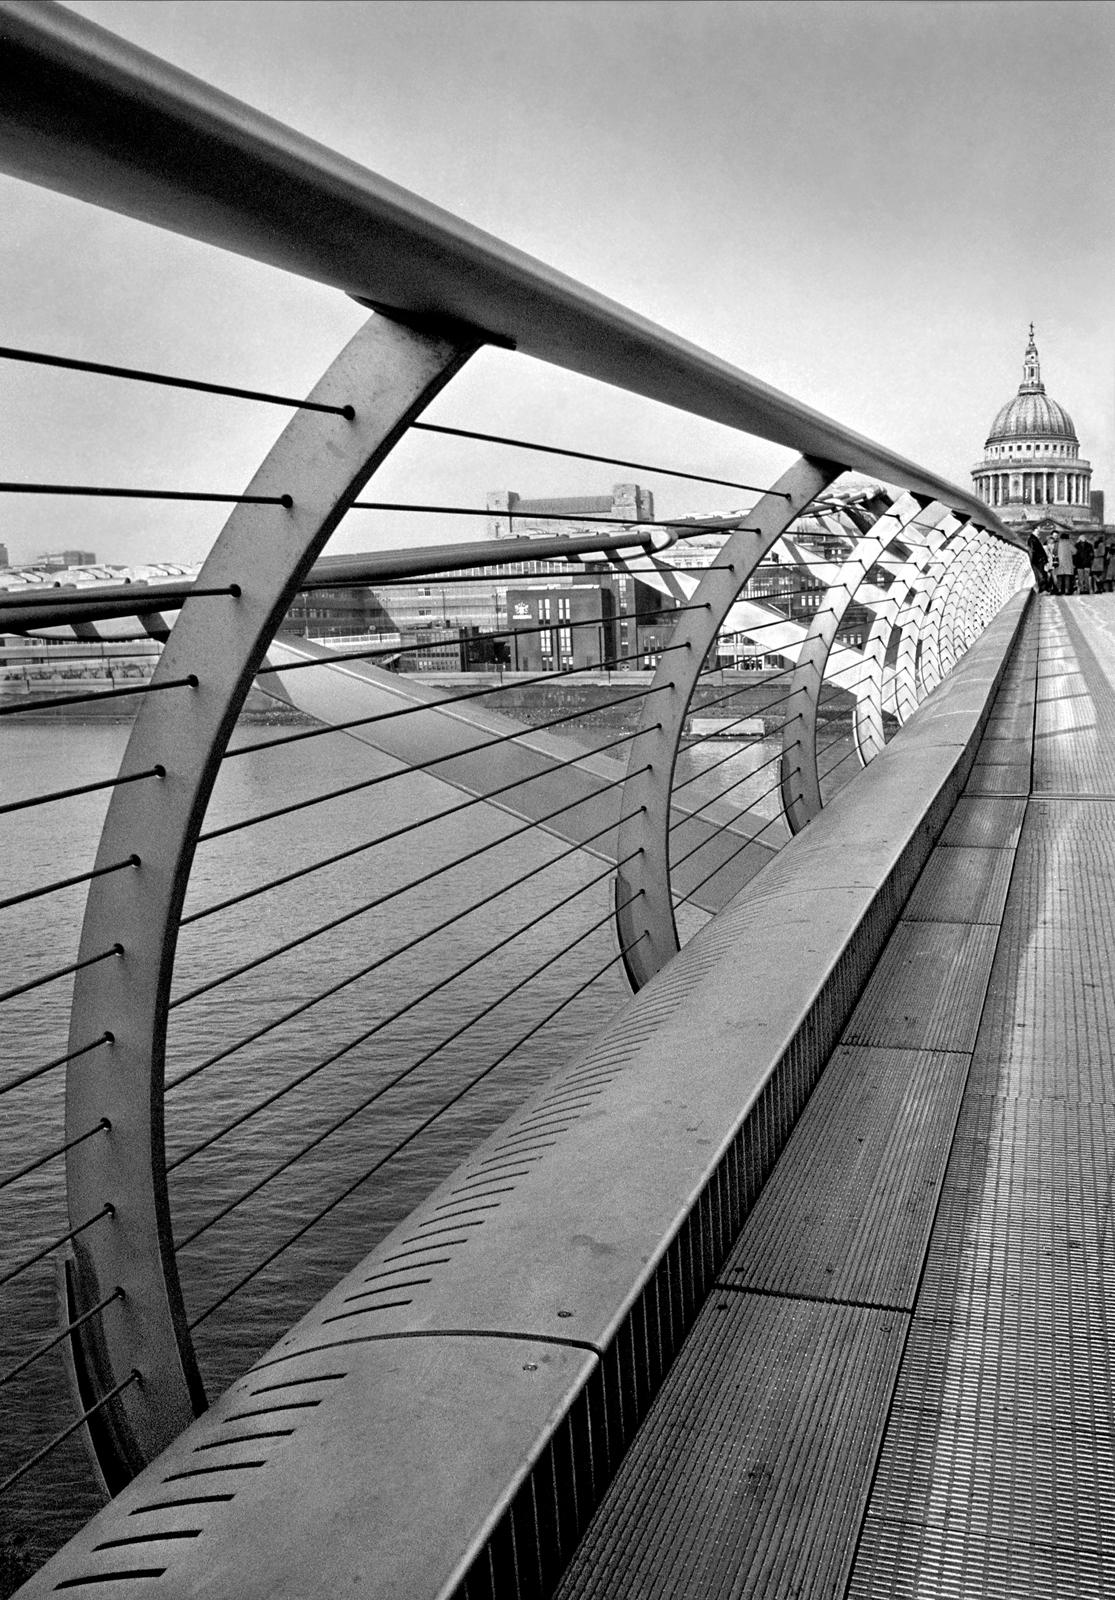 The Crossing (London)